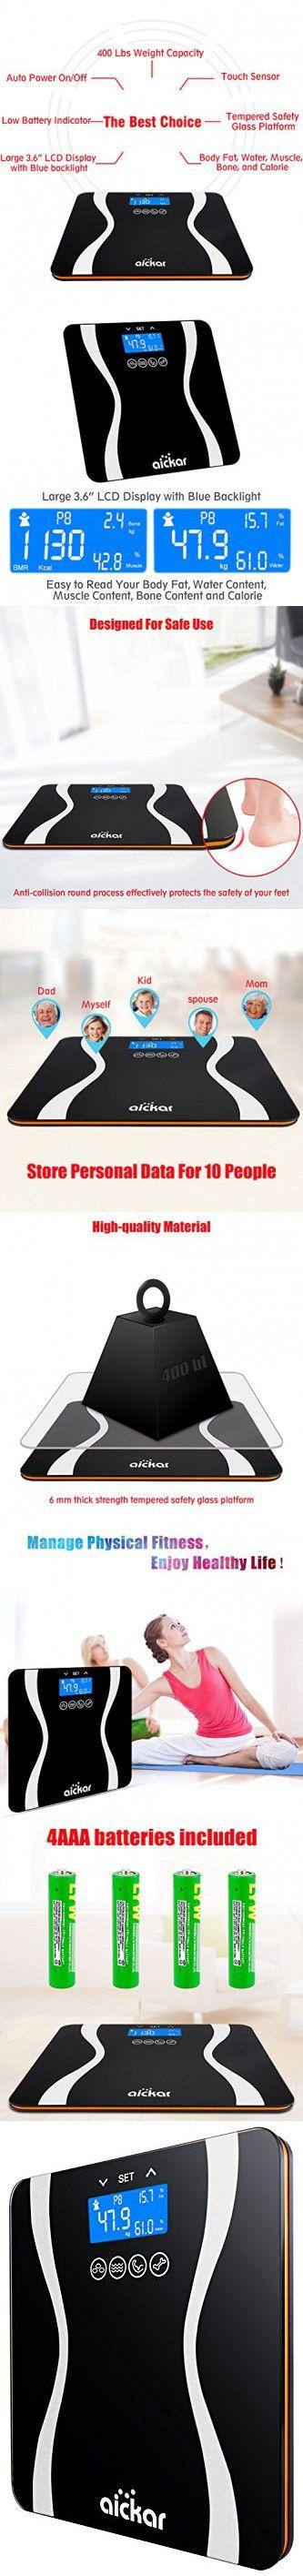 Aickar Bathroom Scale 400 Lbs Capacity Bathroom Scale Measures Weight, Body Fat, Water, & Bone Mass Body Weight Scale Digital Body Weight Scale